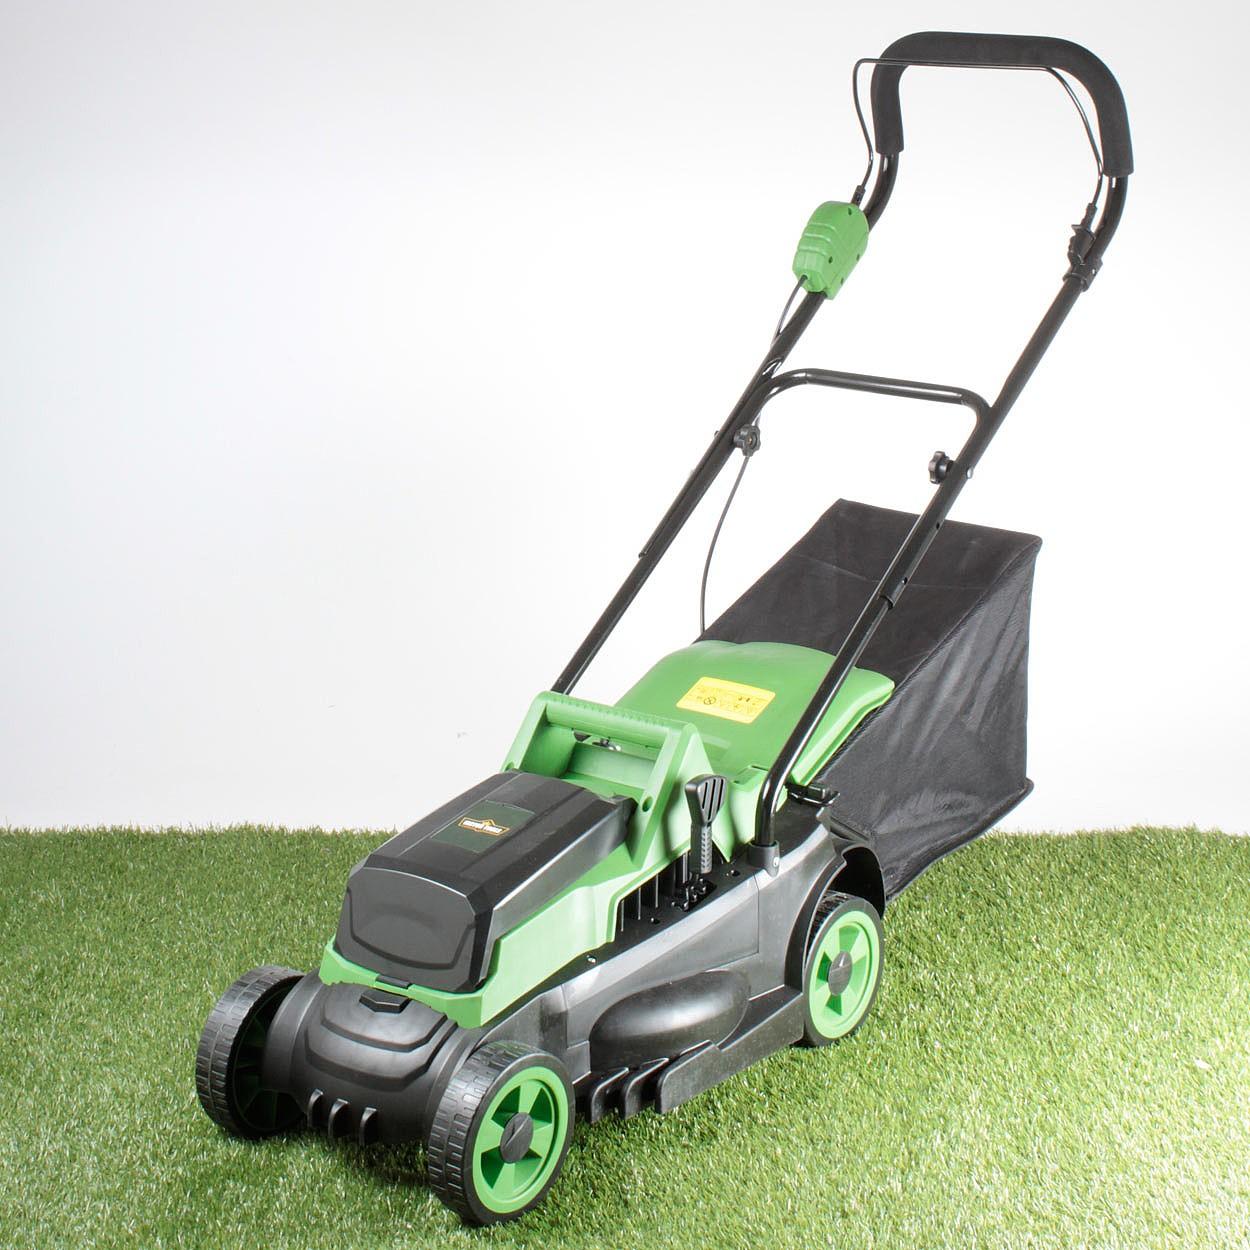 Image of 40V Lawnmower Cordless